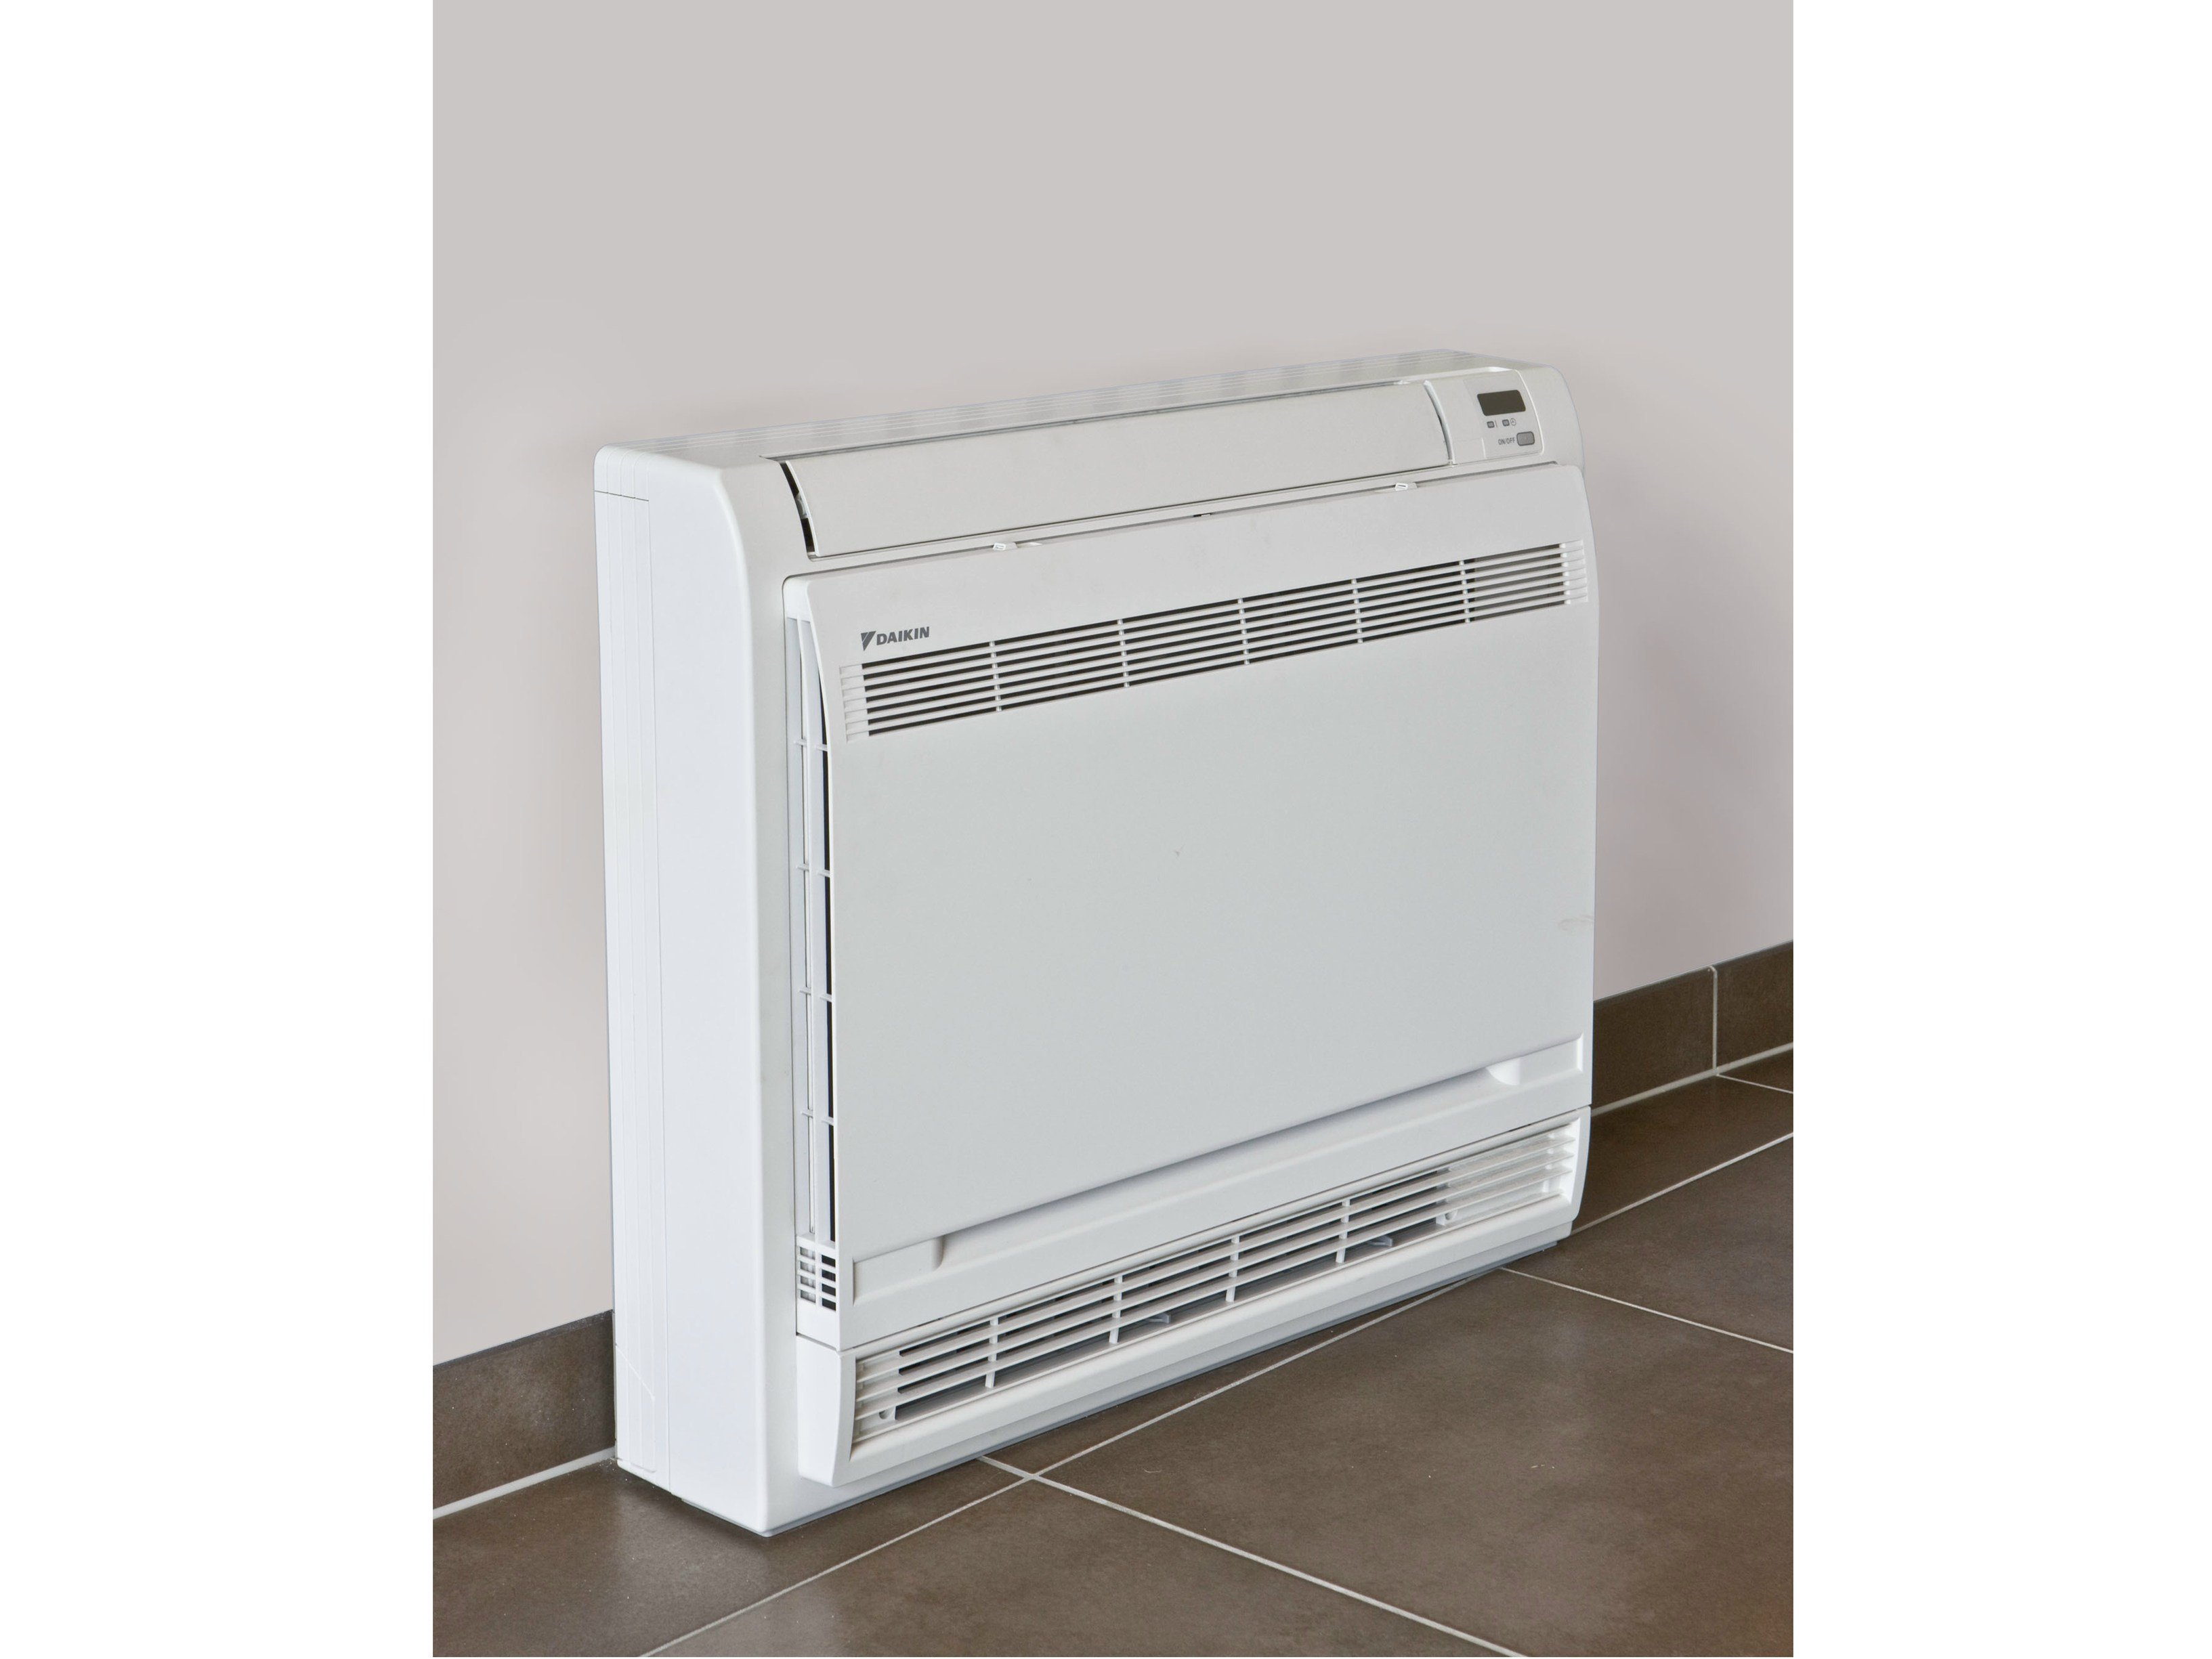 fwxv ventilo convecteur by daikin air conditioning italy. Black Bedroom Furniture Sets. Home Design Ideas